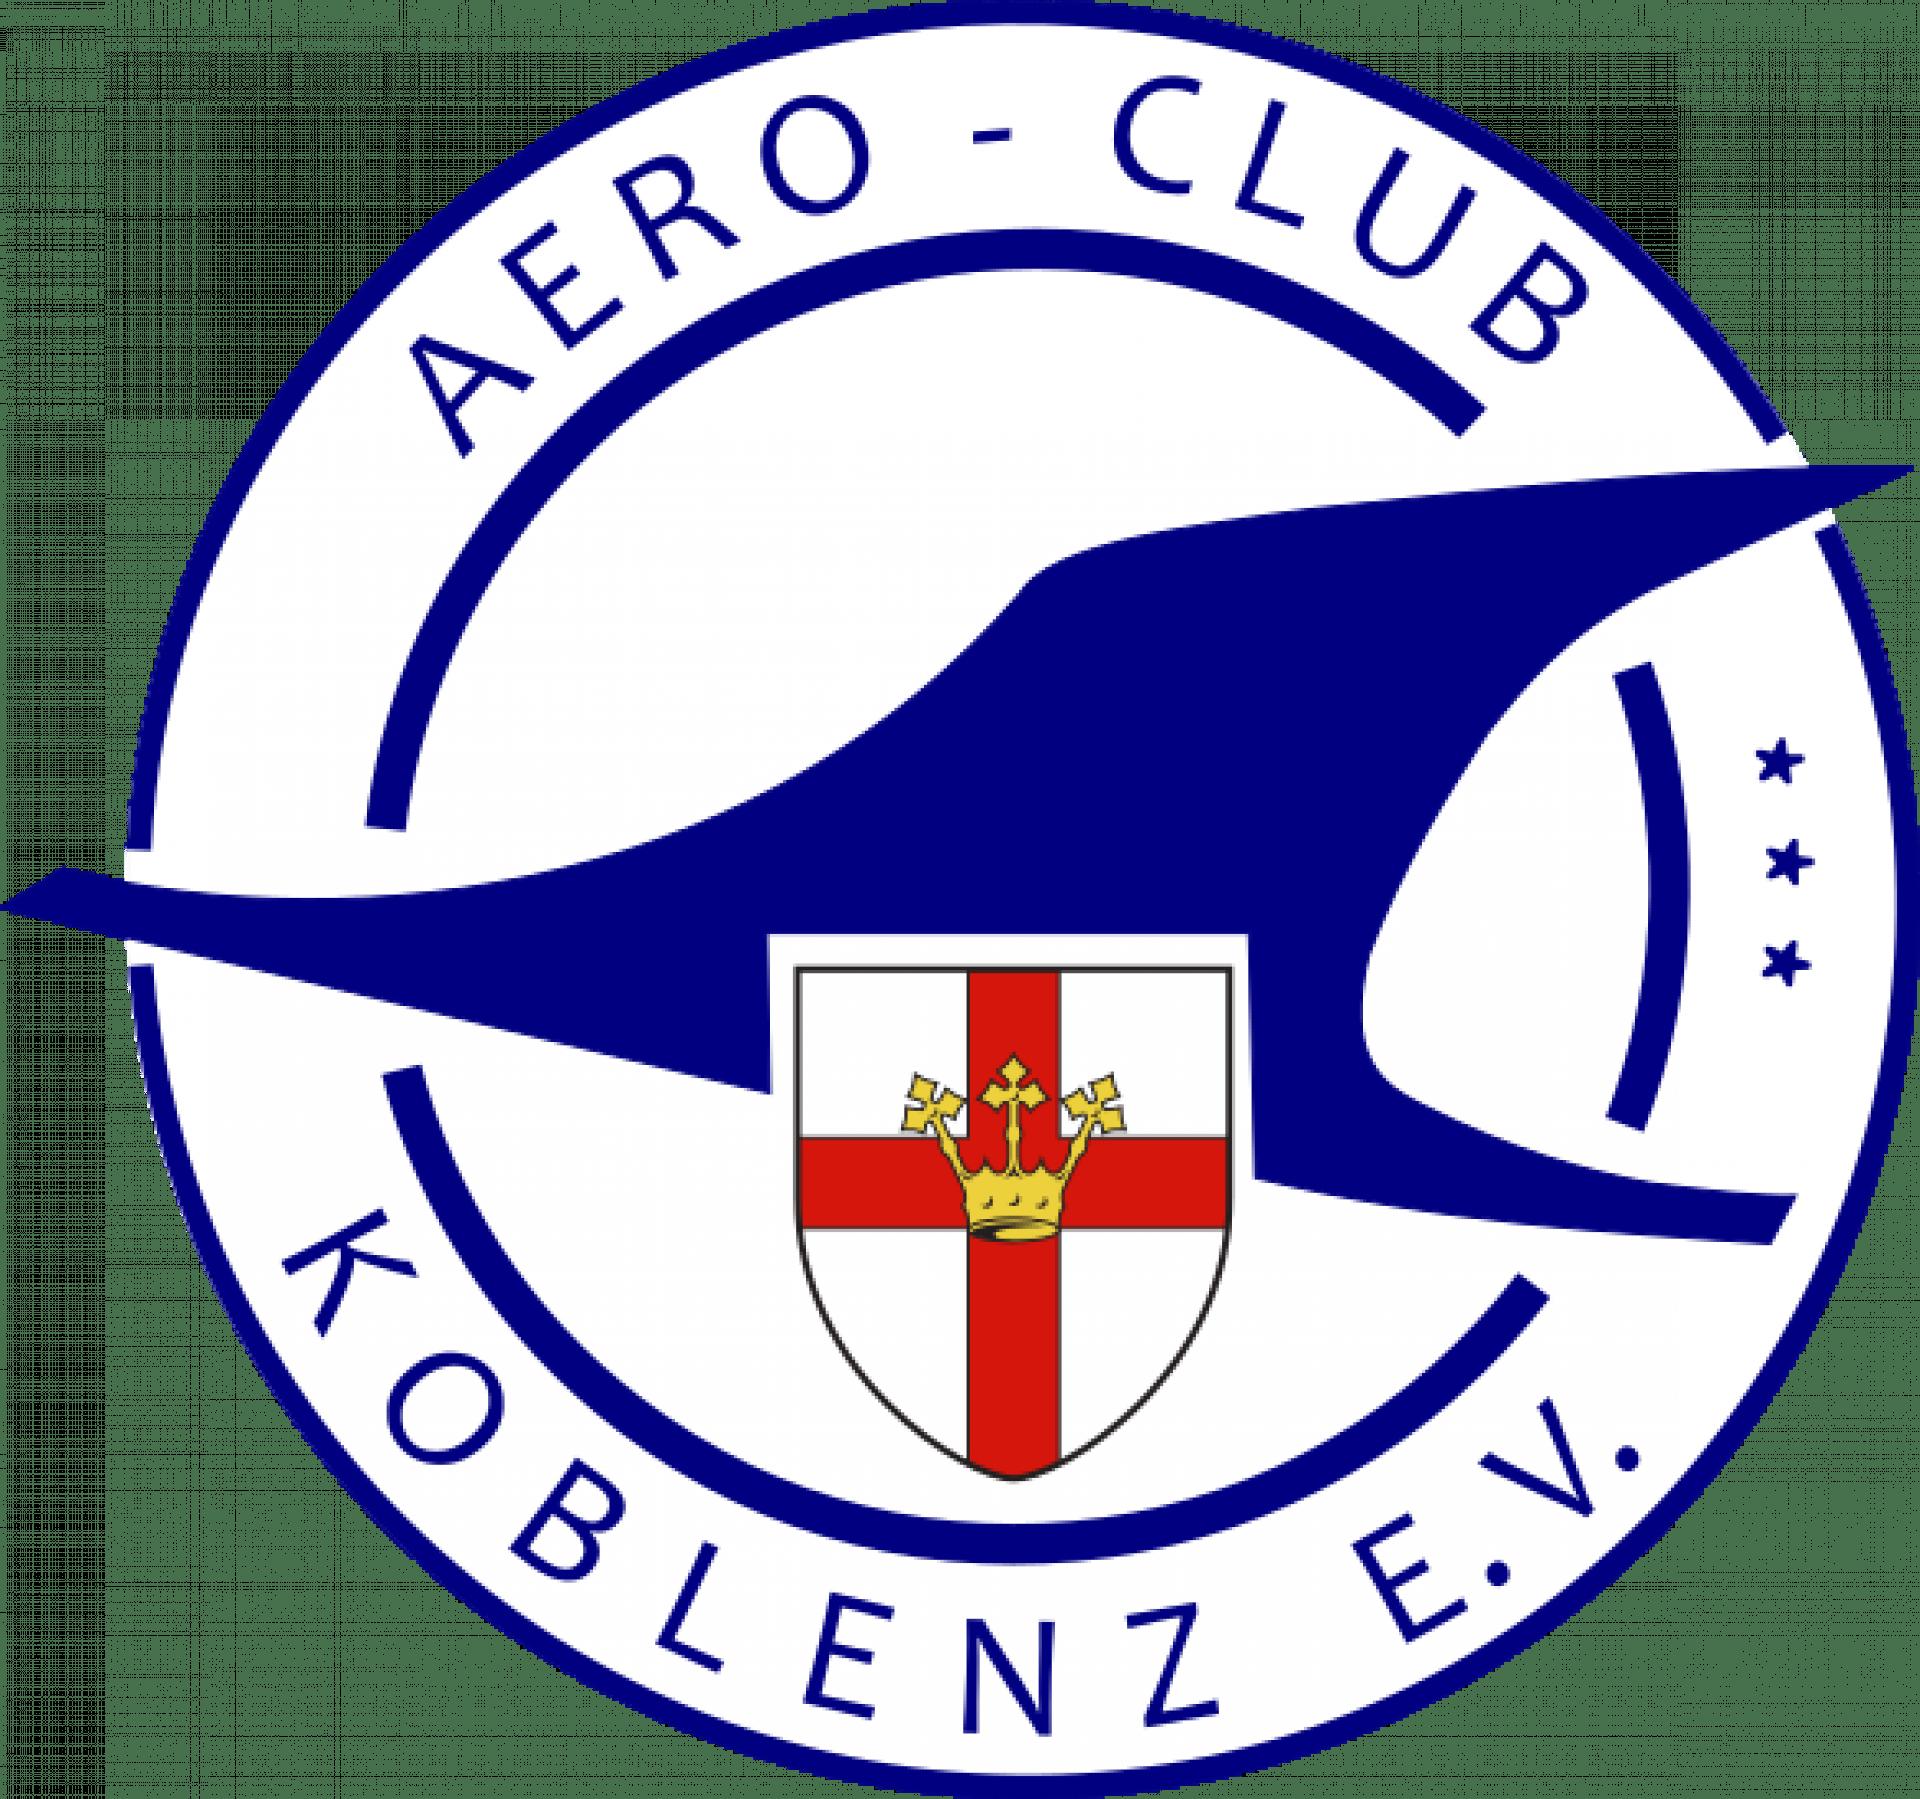 Aero-Club Koblenz e.V.